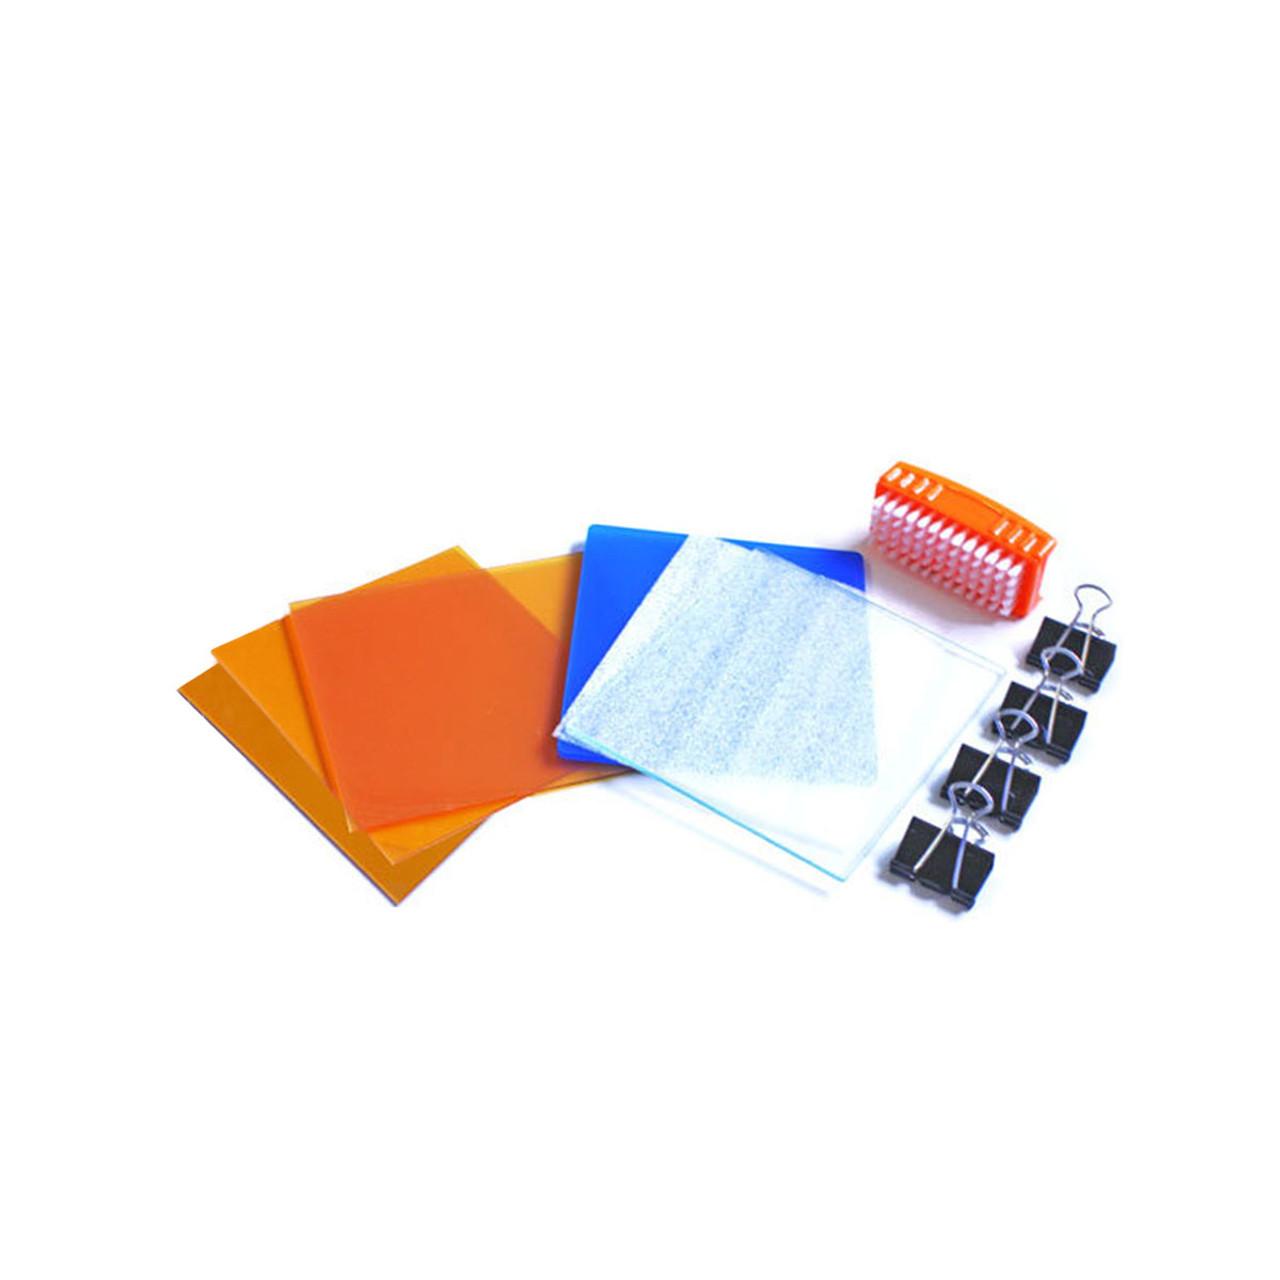 Photopolymer Plate Starter Kit